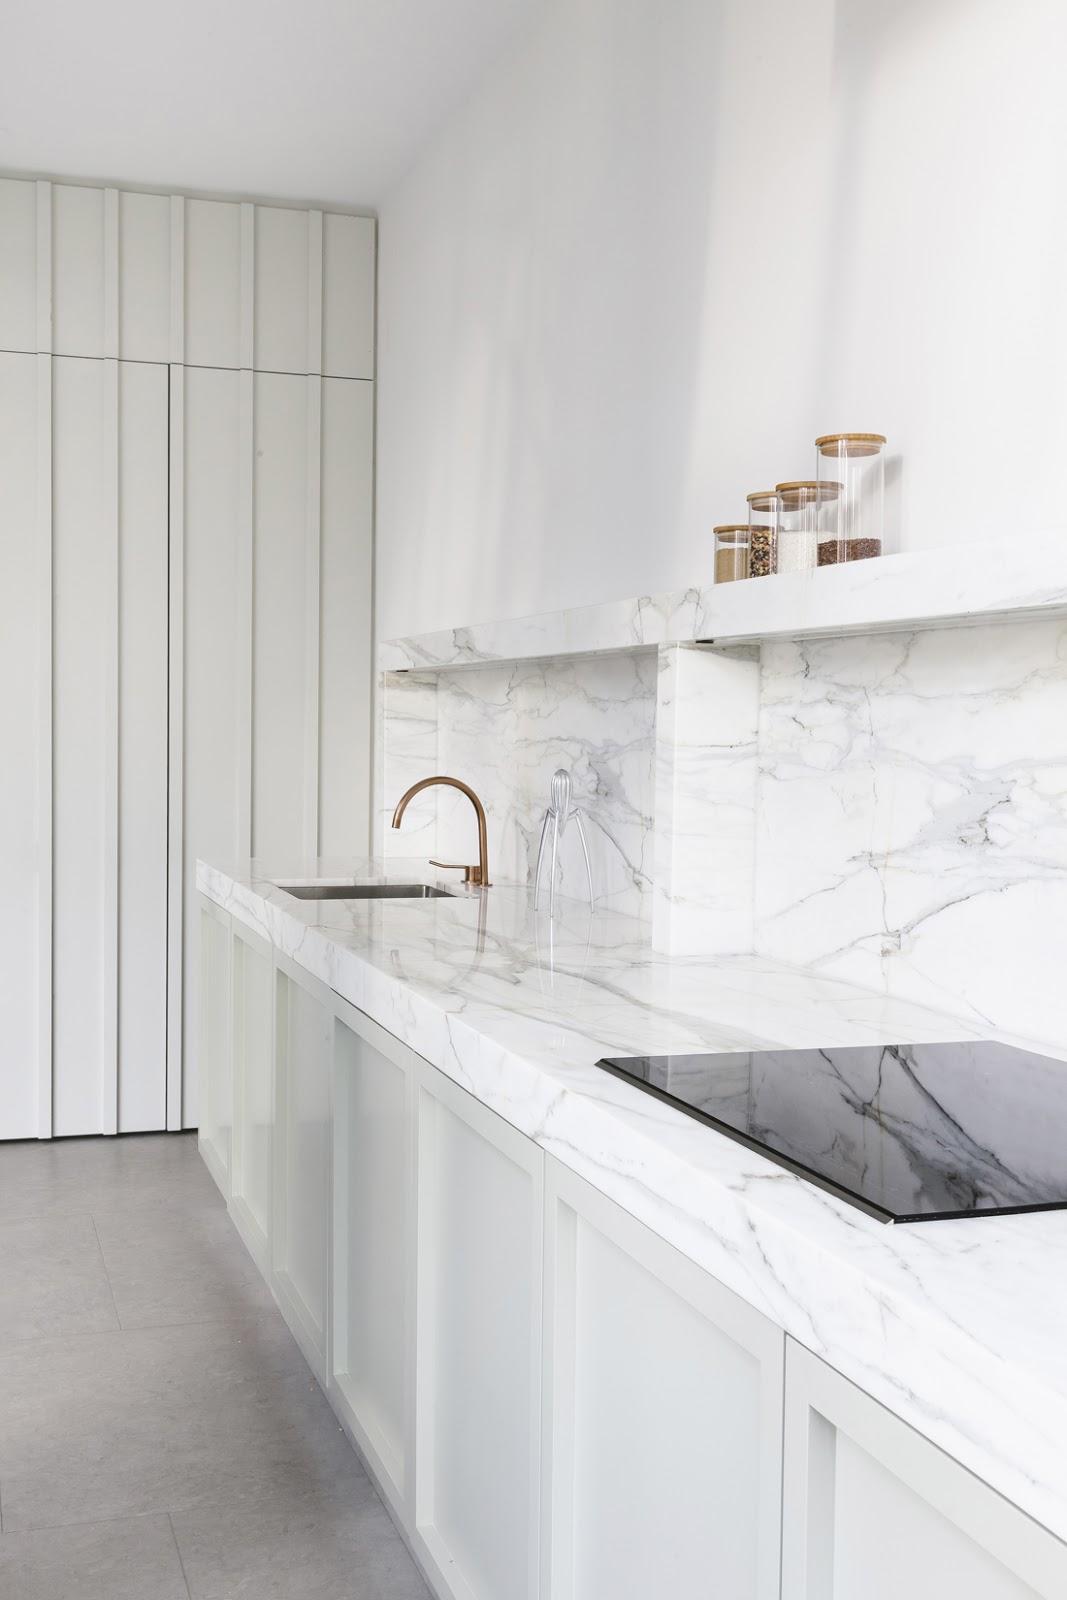 Cucina in verde menta e marmo bianco classico | ARC ART blog by ...